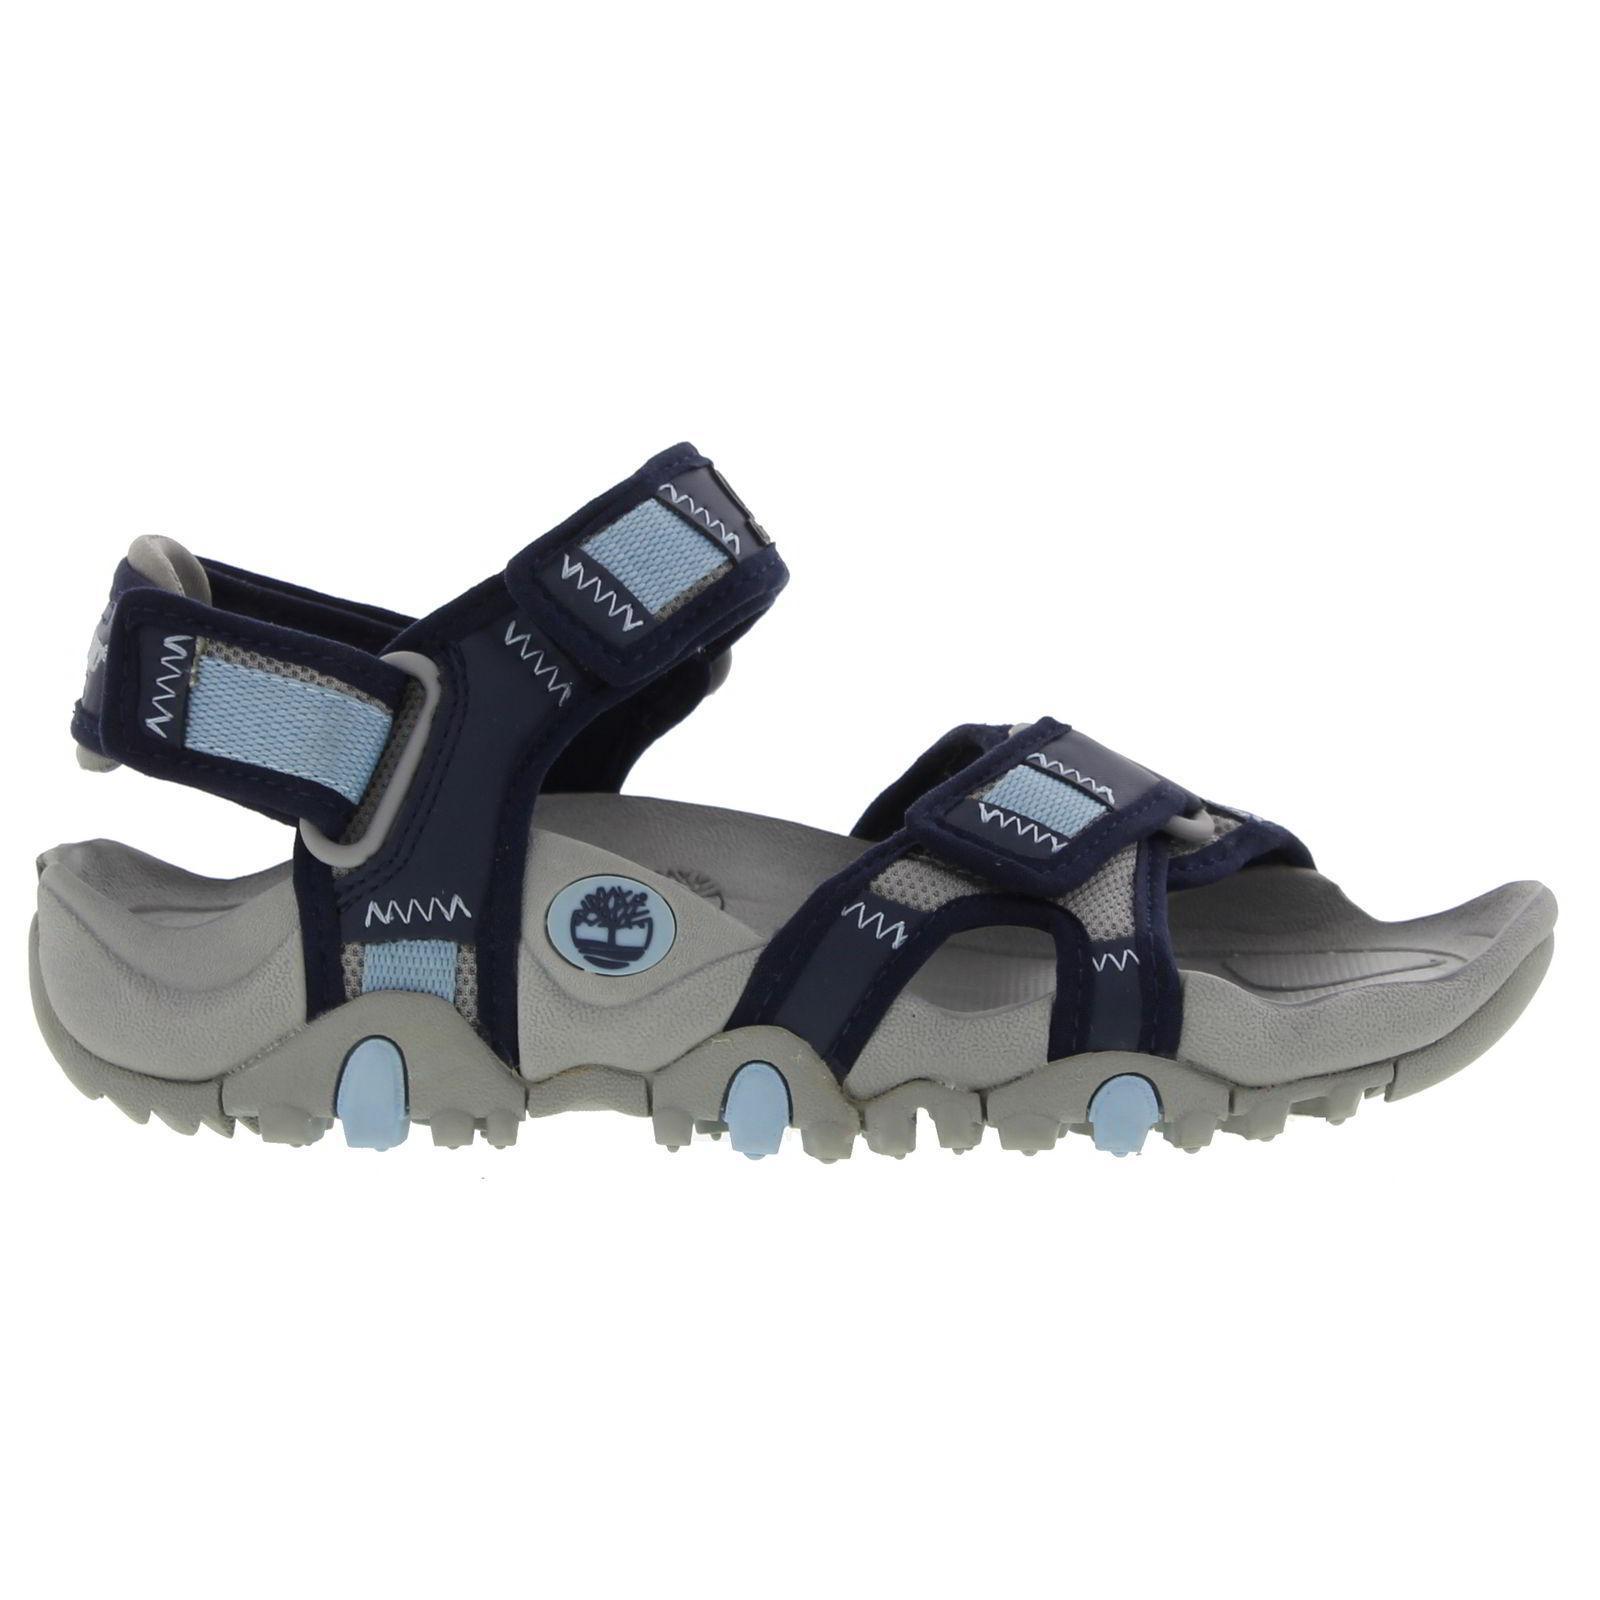 9909051c Timberland Nekkol Trail Adjustable Sandals for Men - Lyst